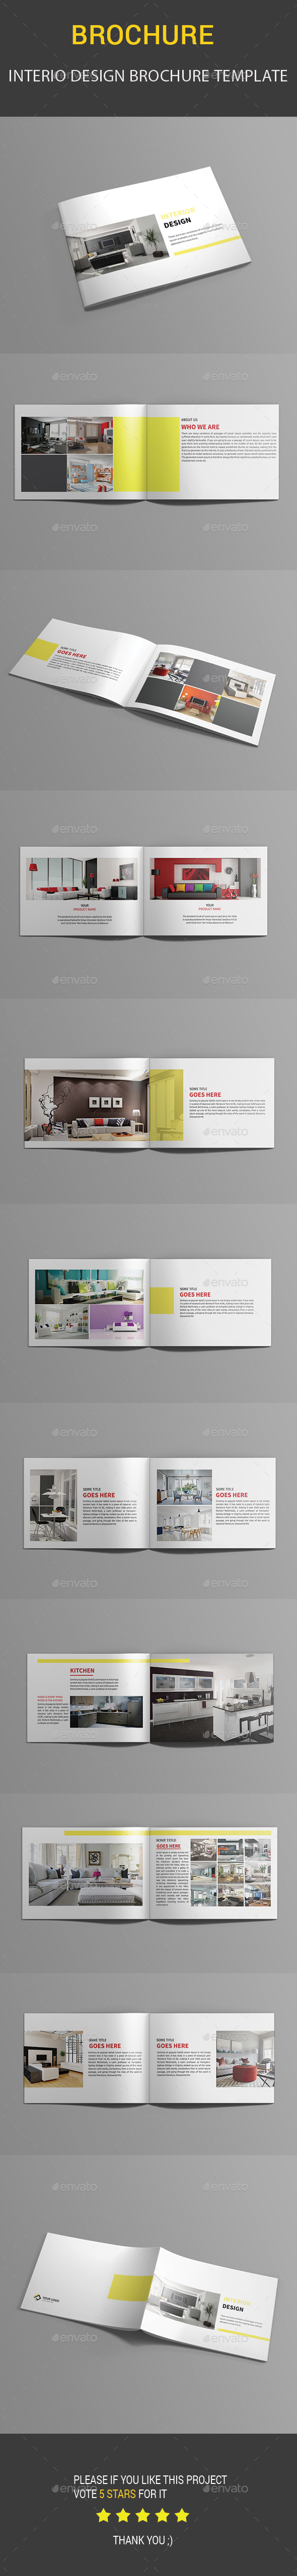 Interio Design Brochure Template - Catalogs Brochures